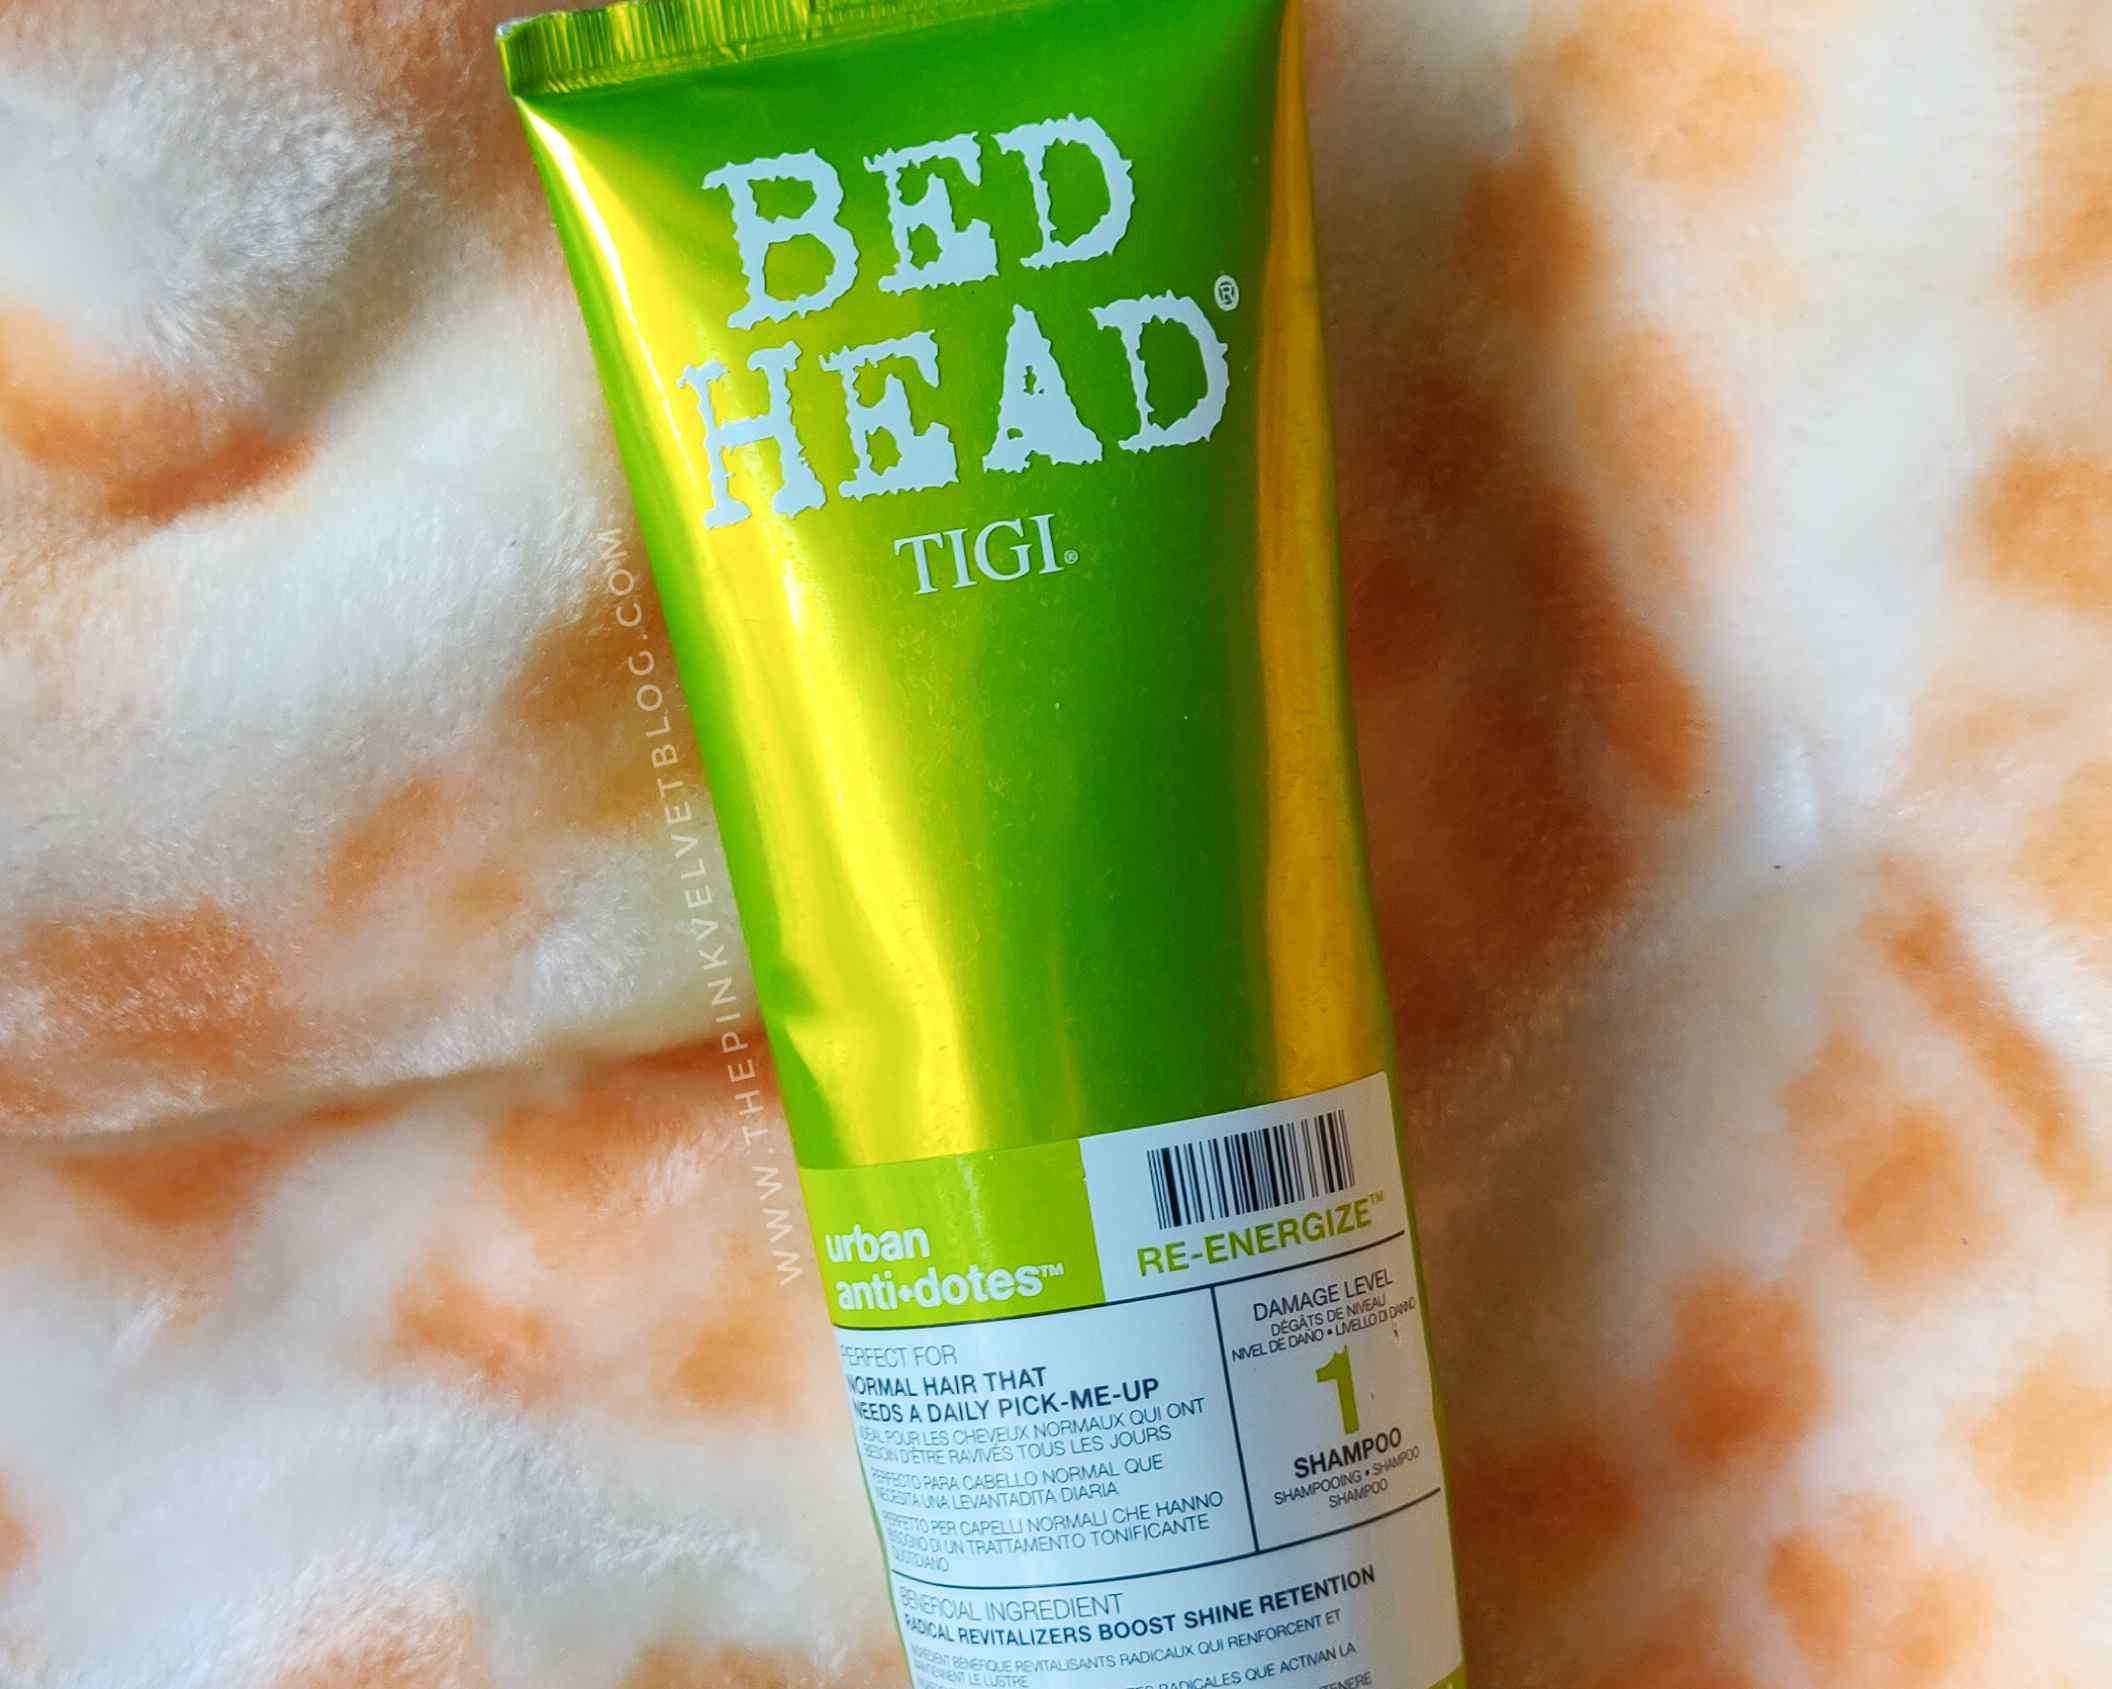 TIGI Bed Head Re-Energize Shampoo – Review